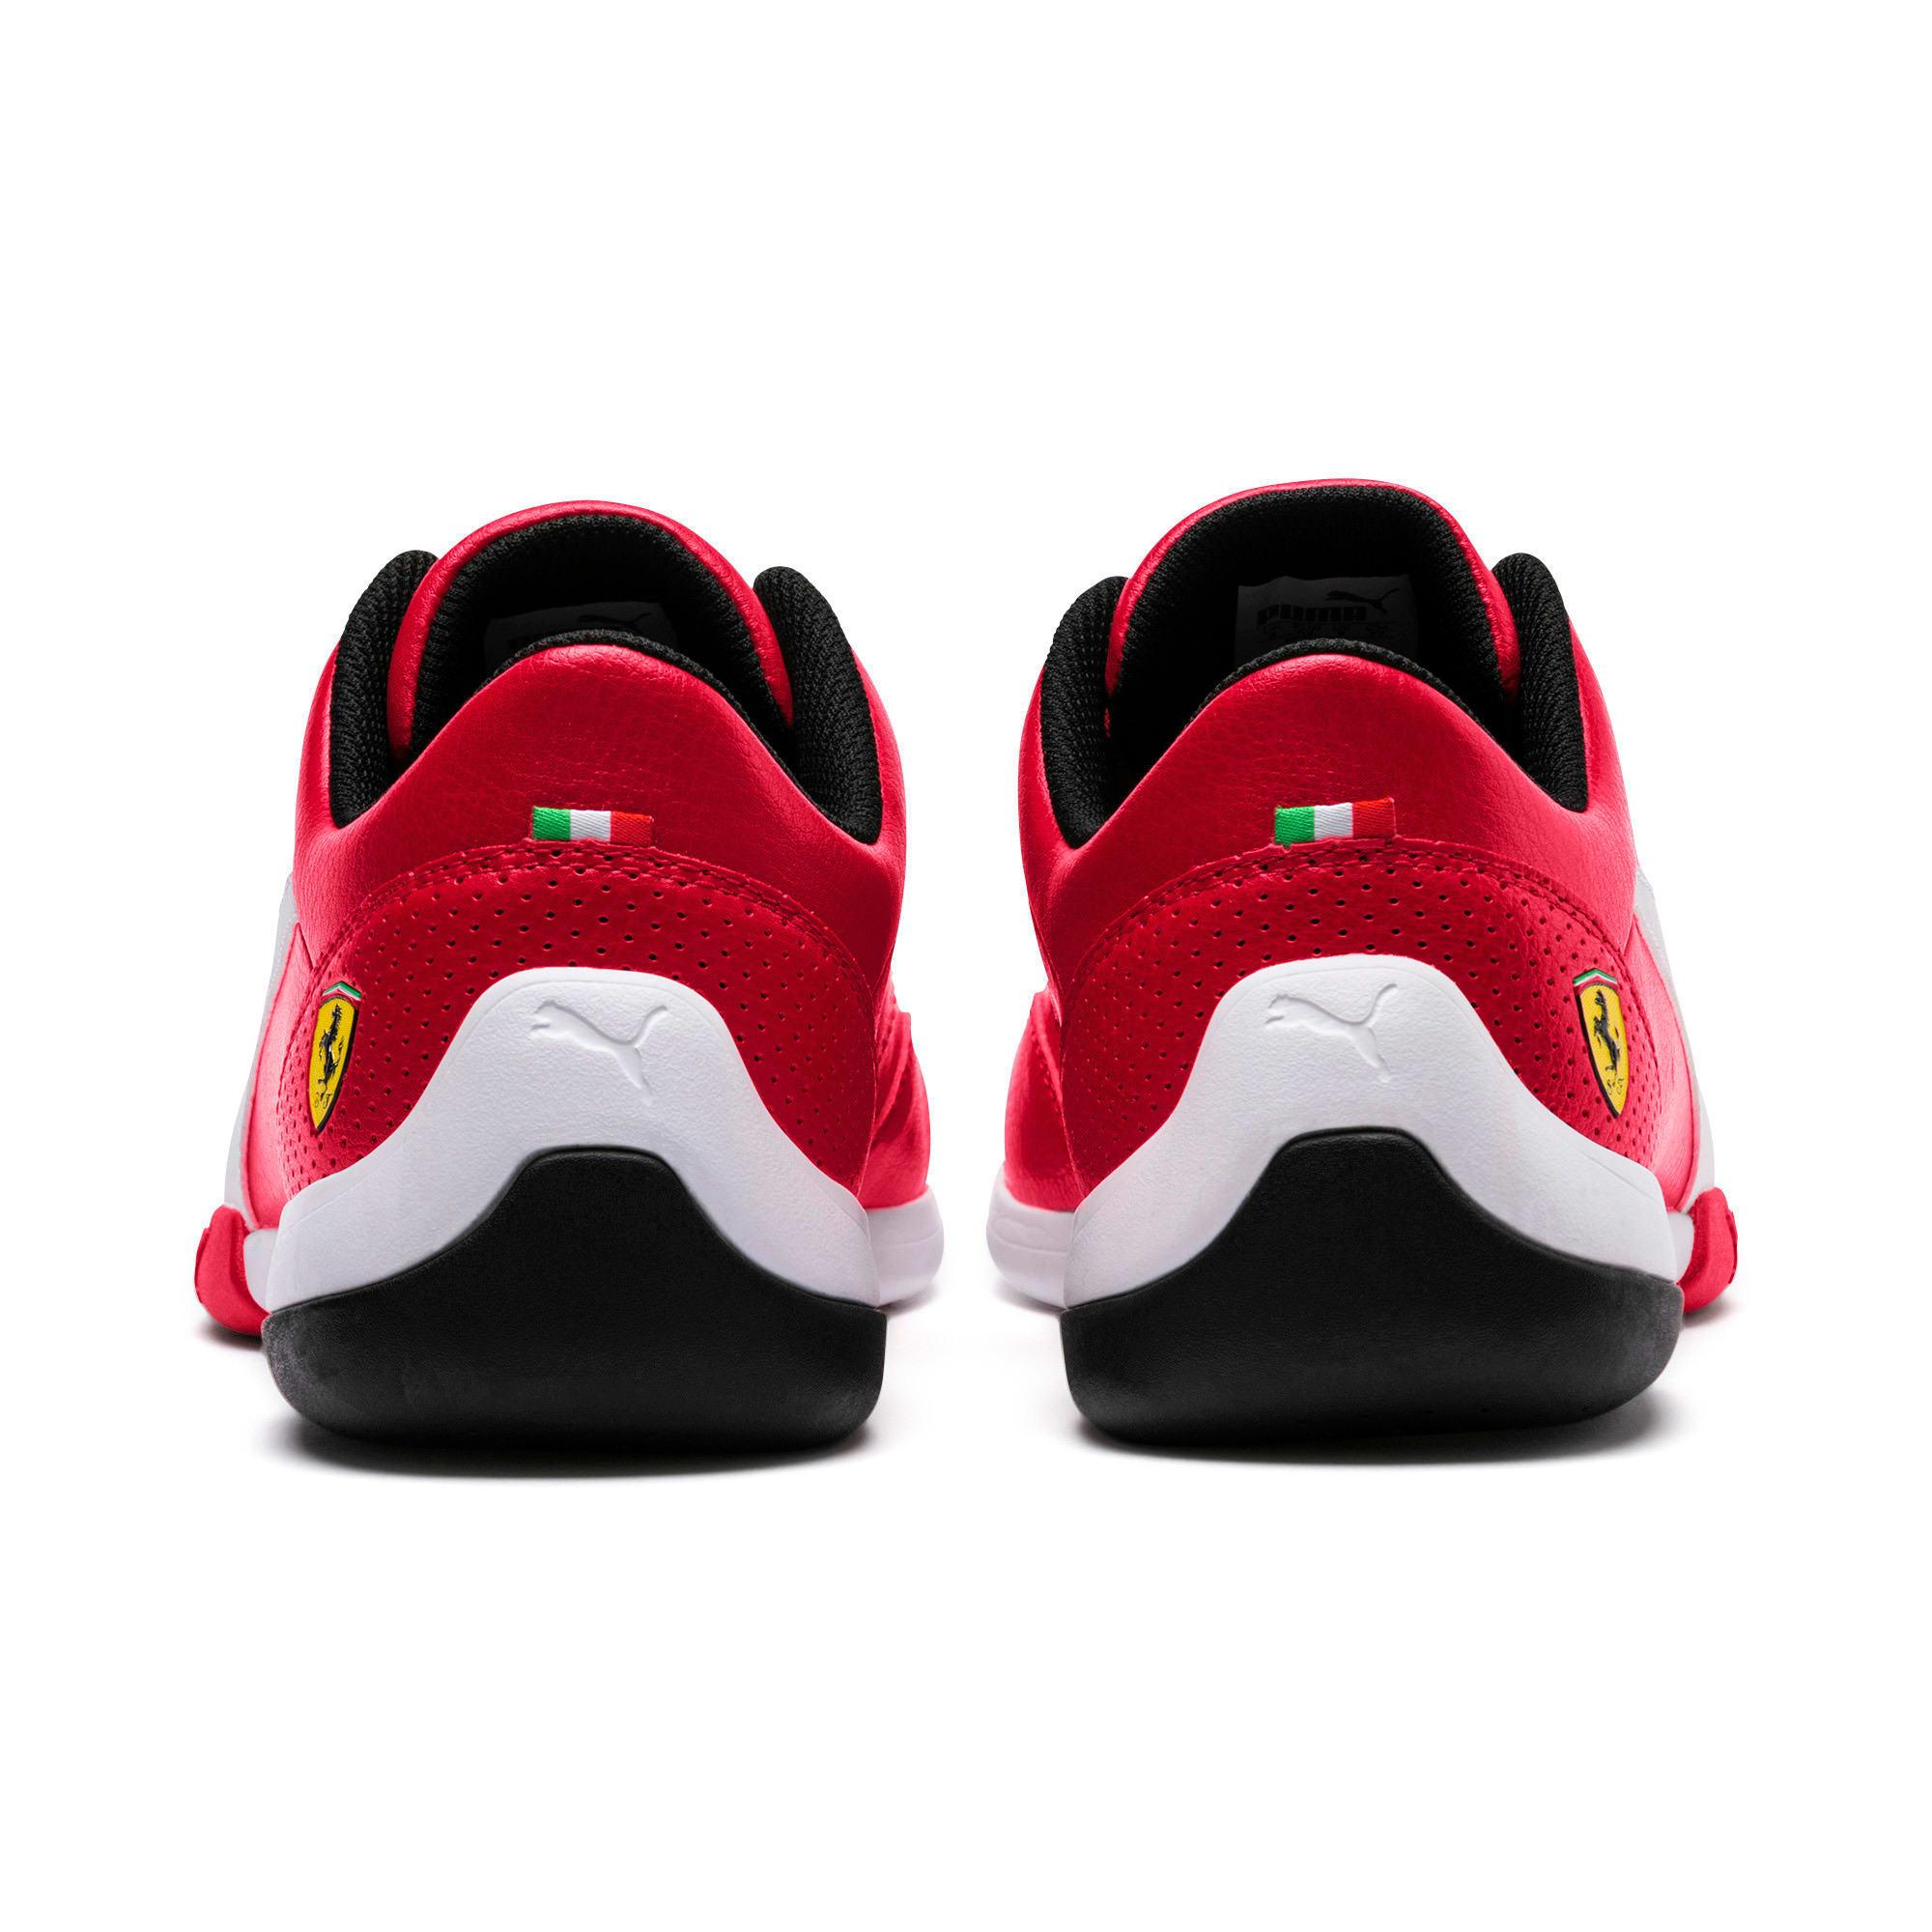 Thumbnail 3 of Scuderia Ferrari Kart Cat III Shoes, Rosso Corsa-Puma White, medium